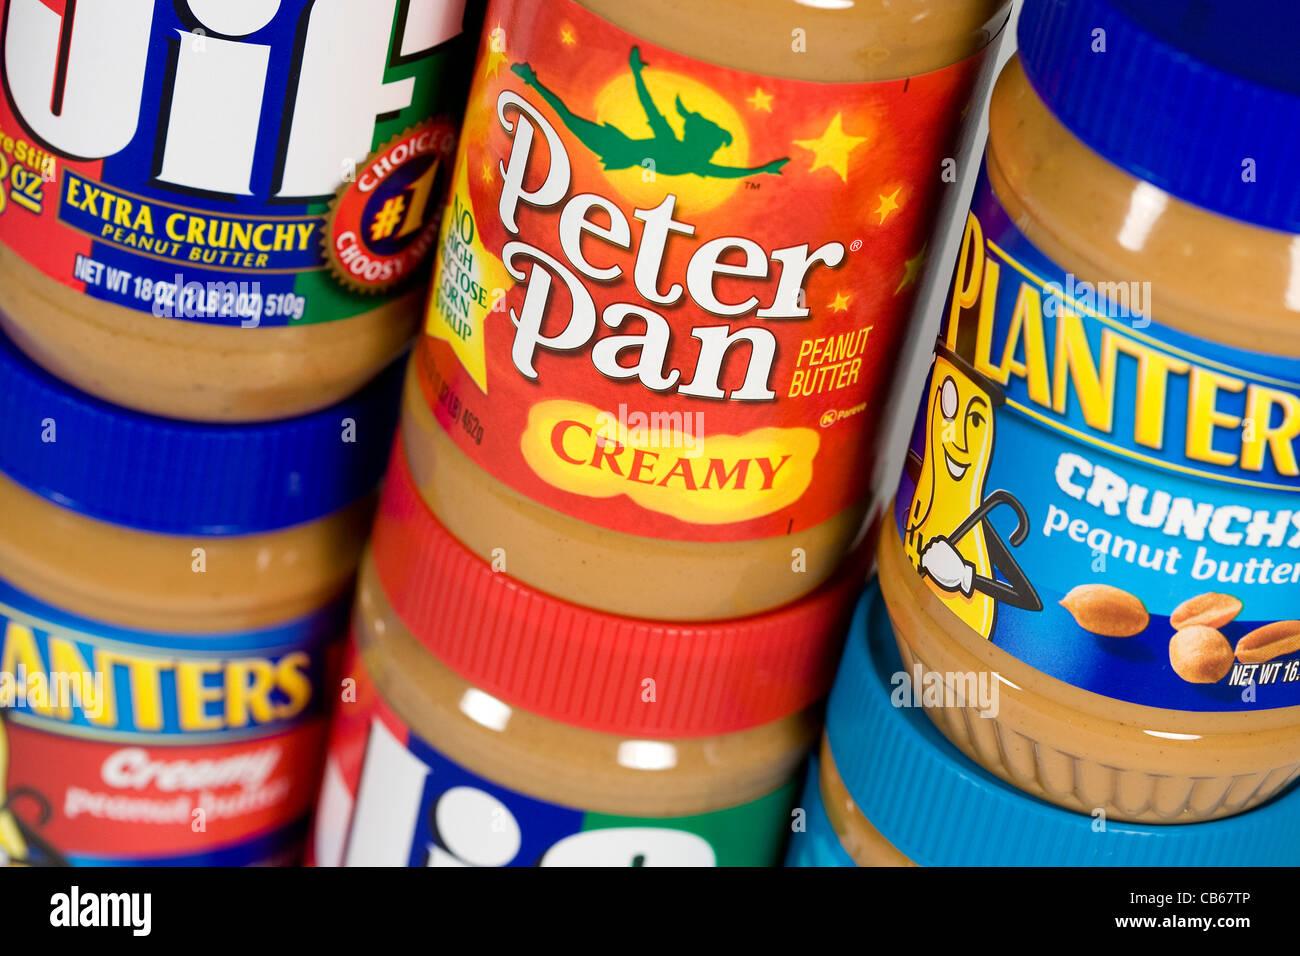 recipe: peter pan peanut butter recall 2016 [33]